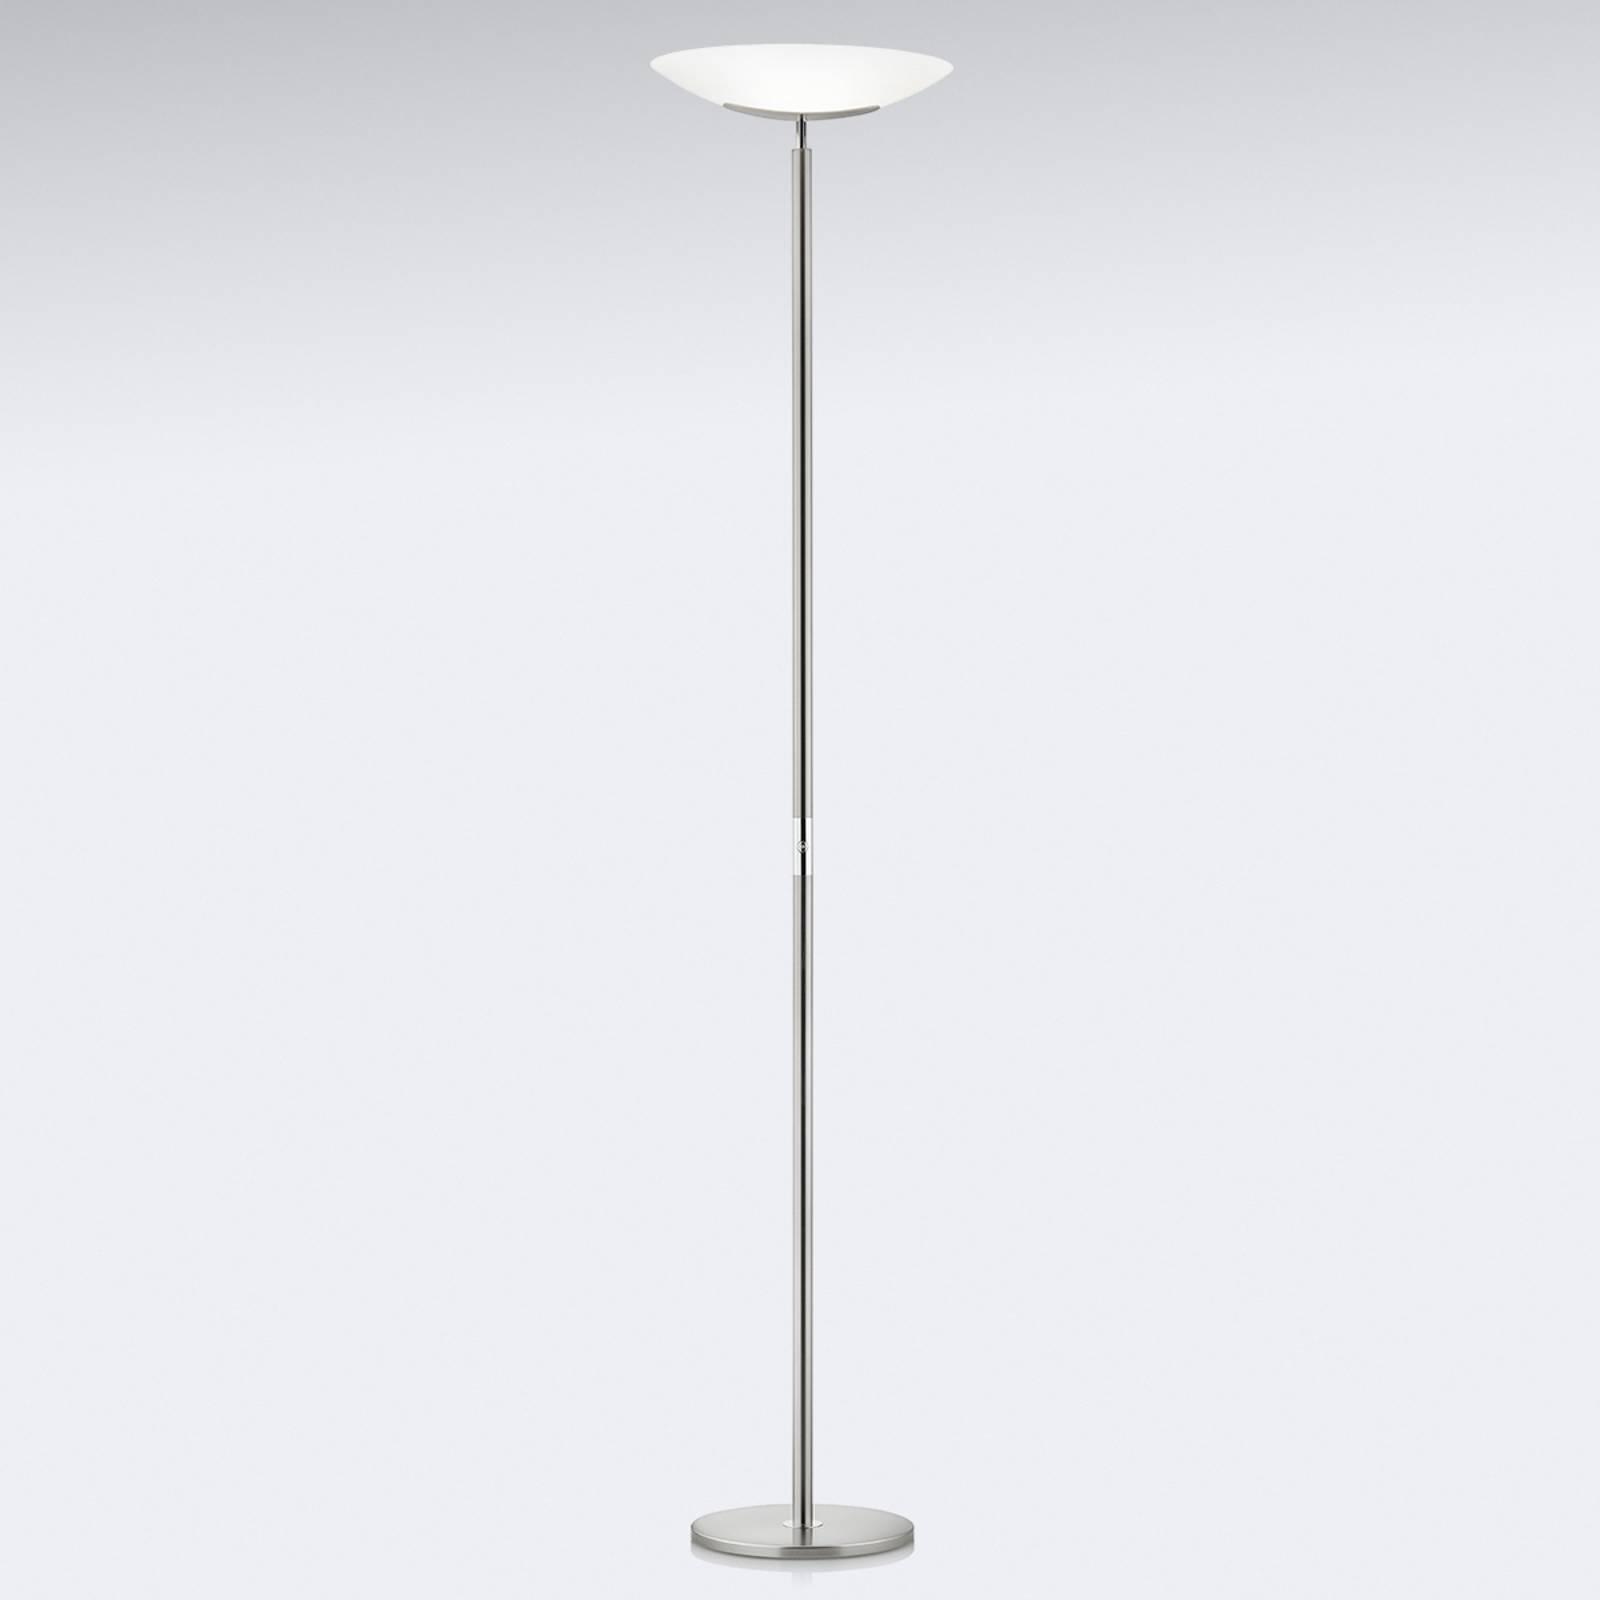 Hoogwaardige LED uplighter Mika in nikkel-chroom